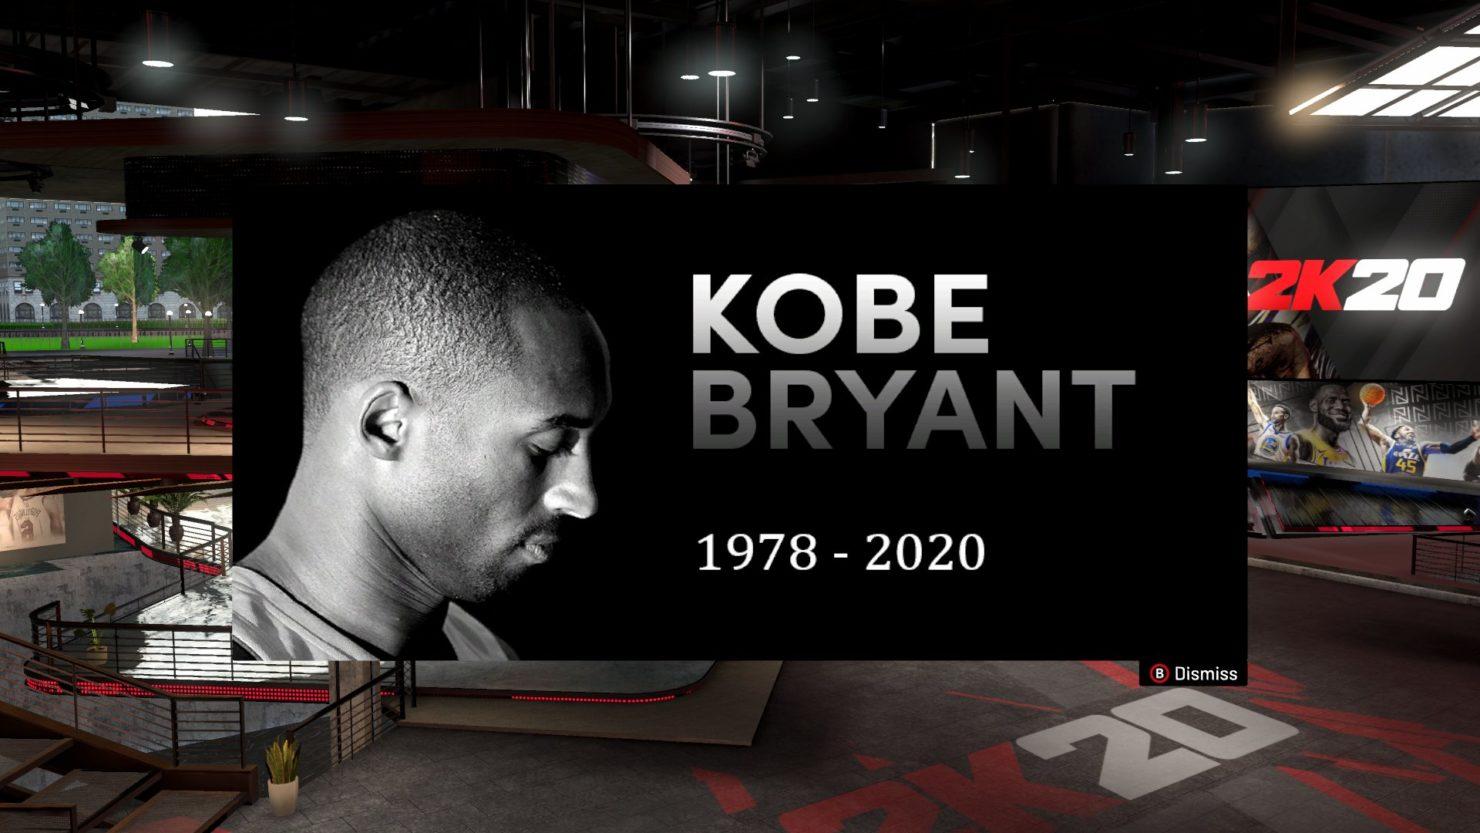 kobe_bryant_nba2k20_tribute-1480x833